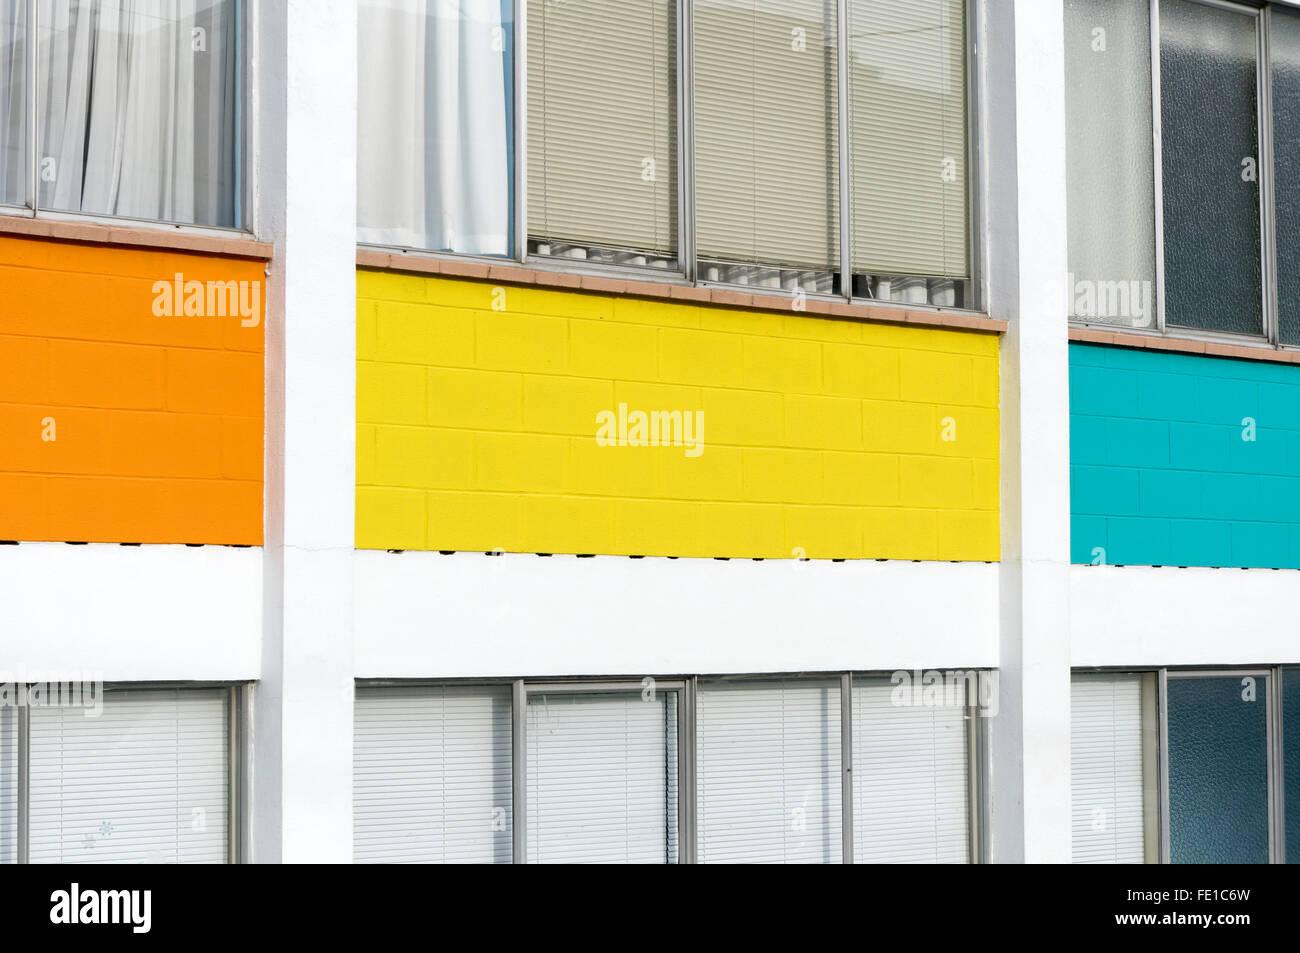 Decorative Panels Stock Photos & Decorative Panels Stock Images - Alamy